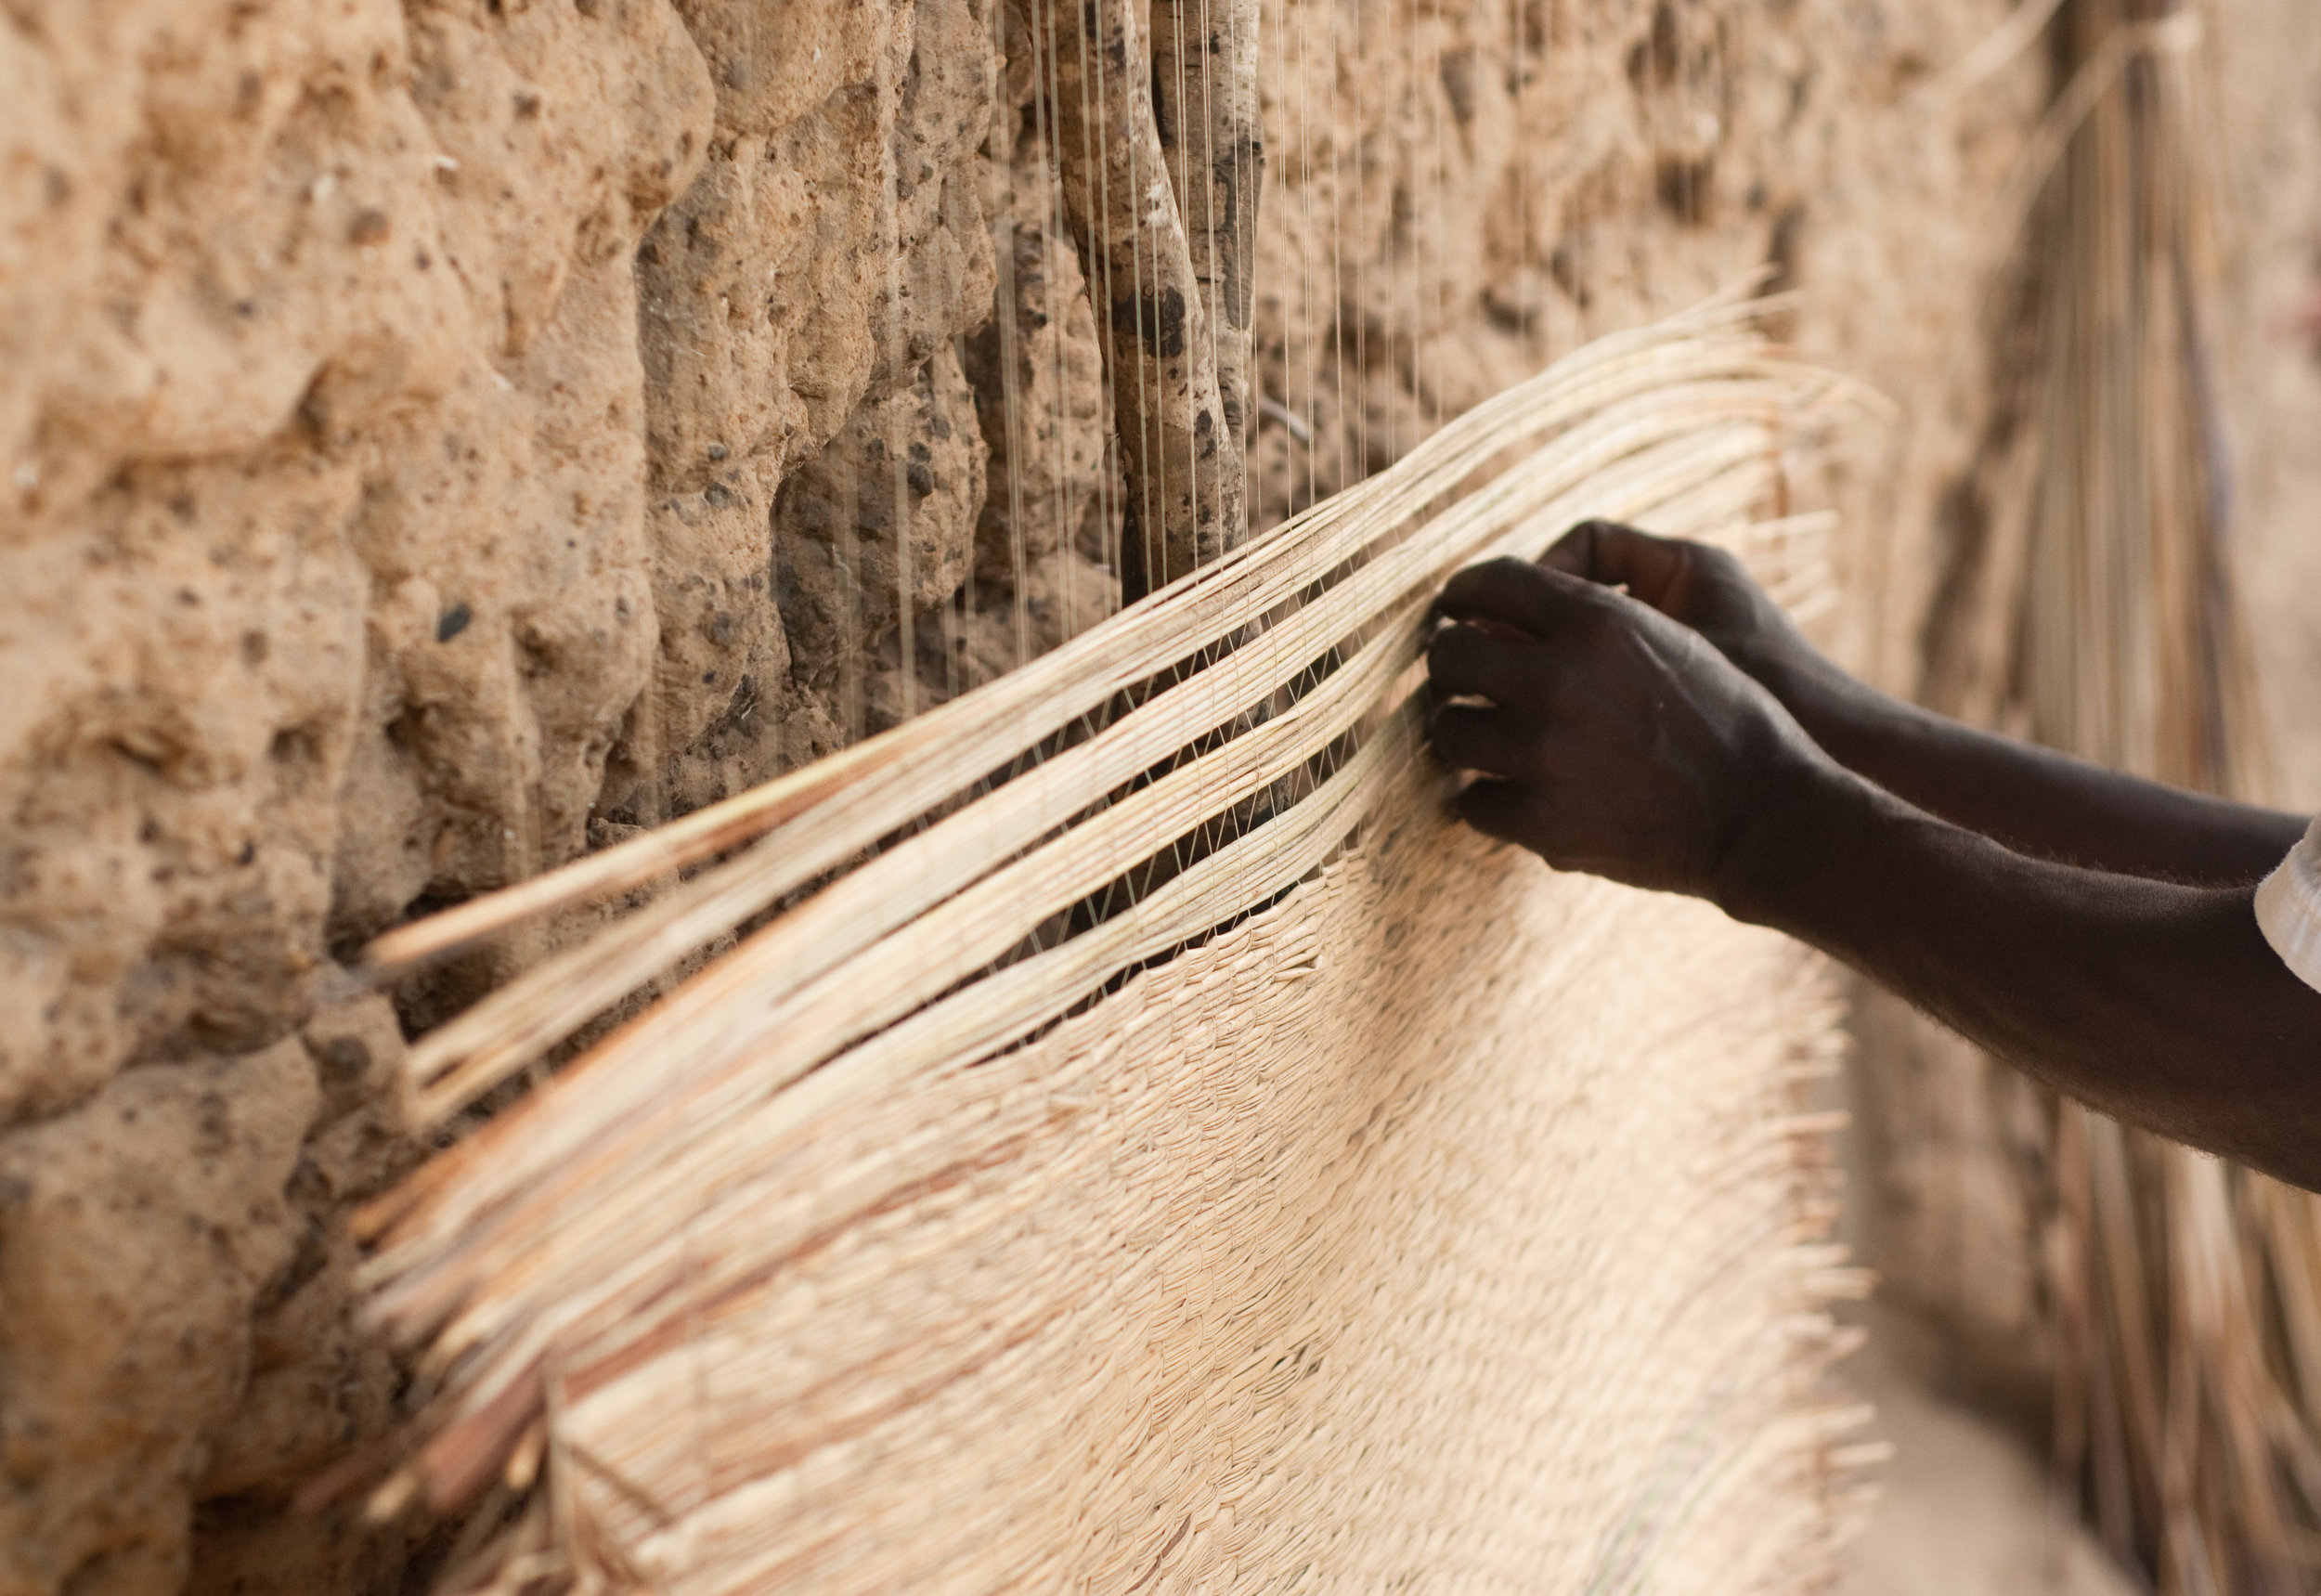 Belinda's father weaving mats